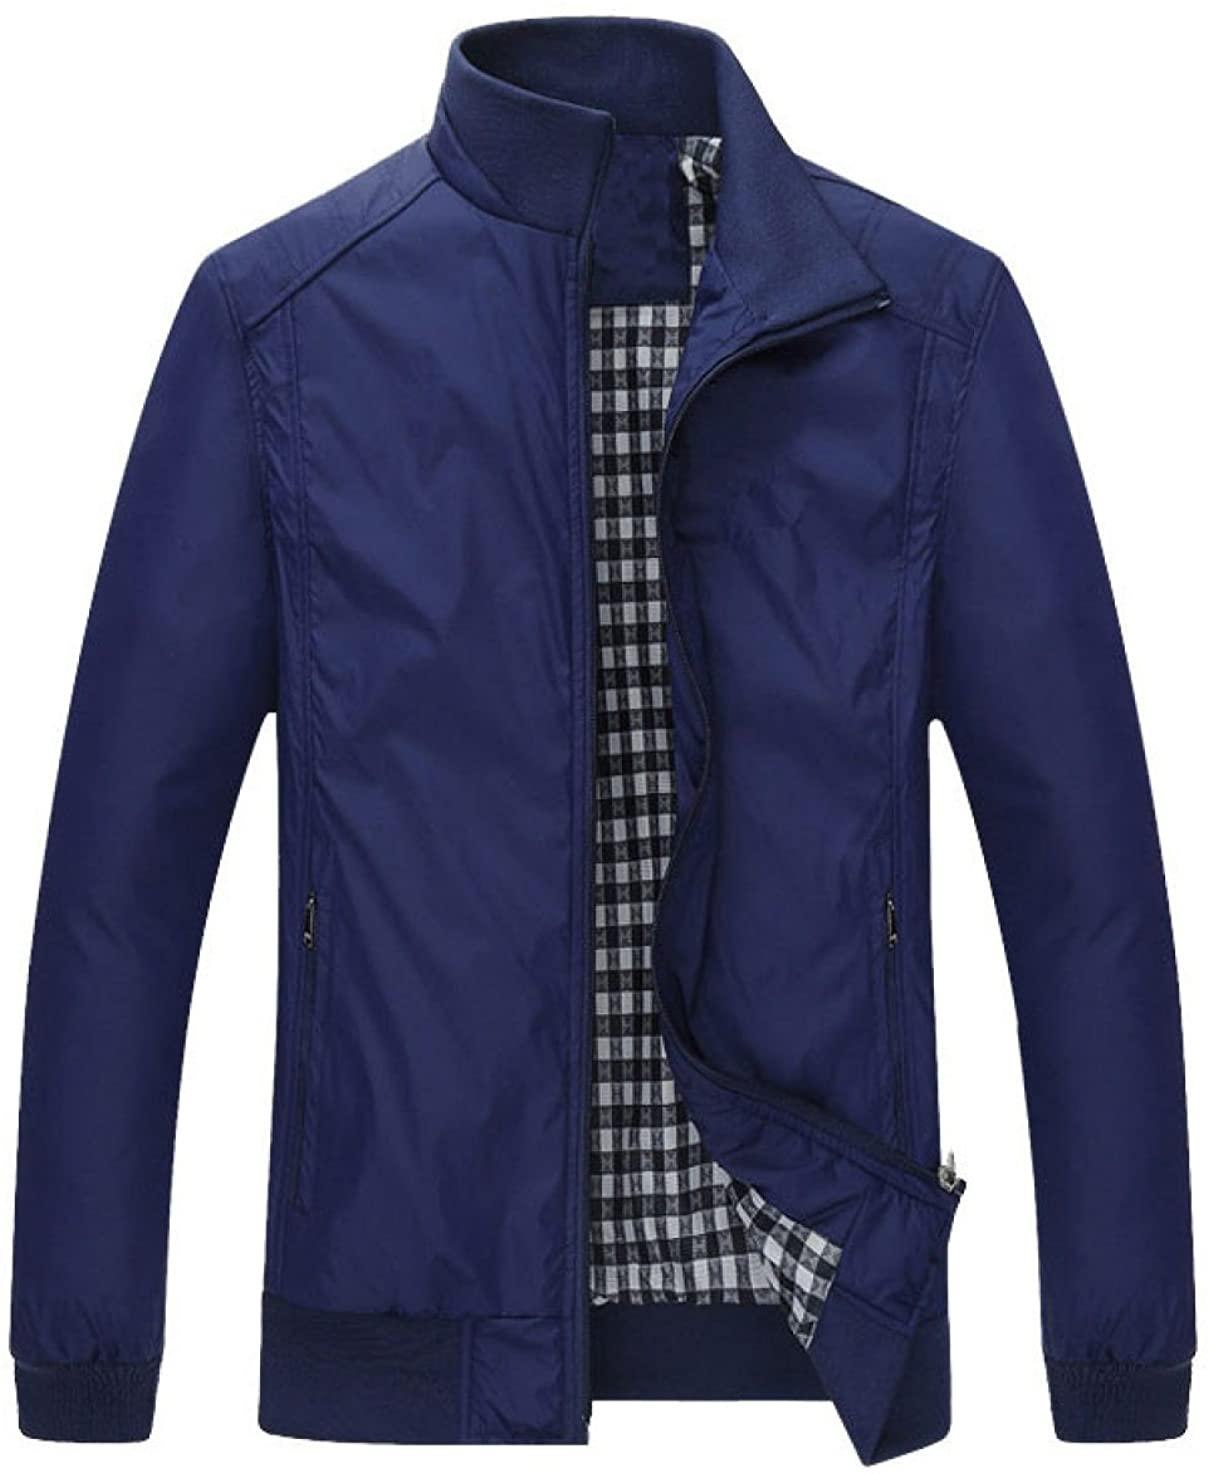 Men 's Velvet Jacket Men' S Large Size Loose Collar Top